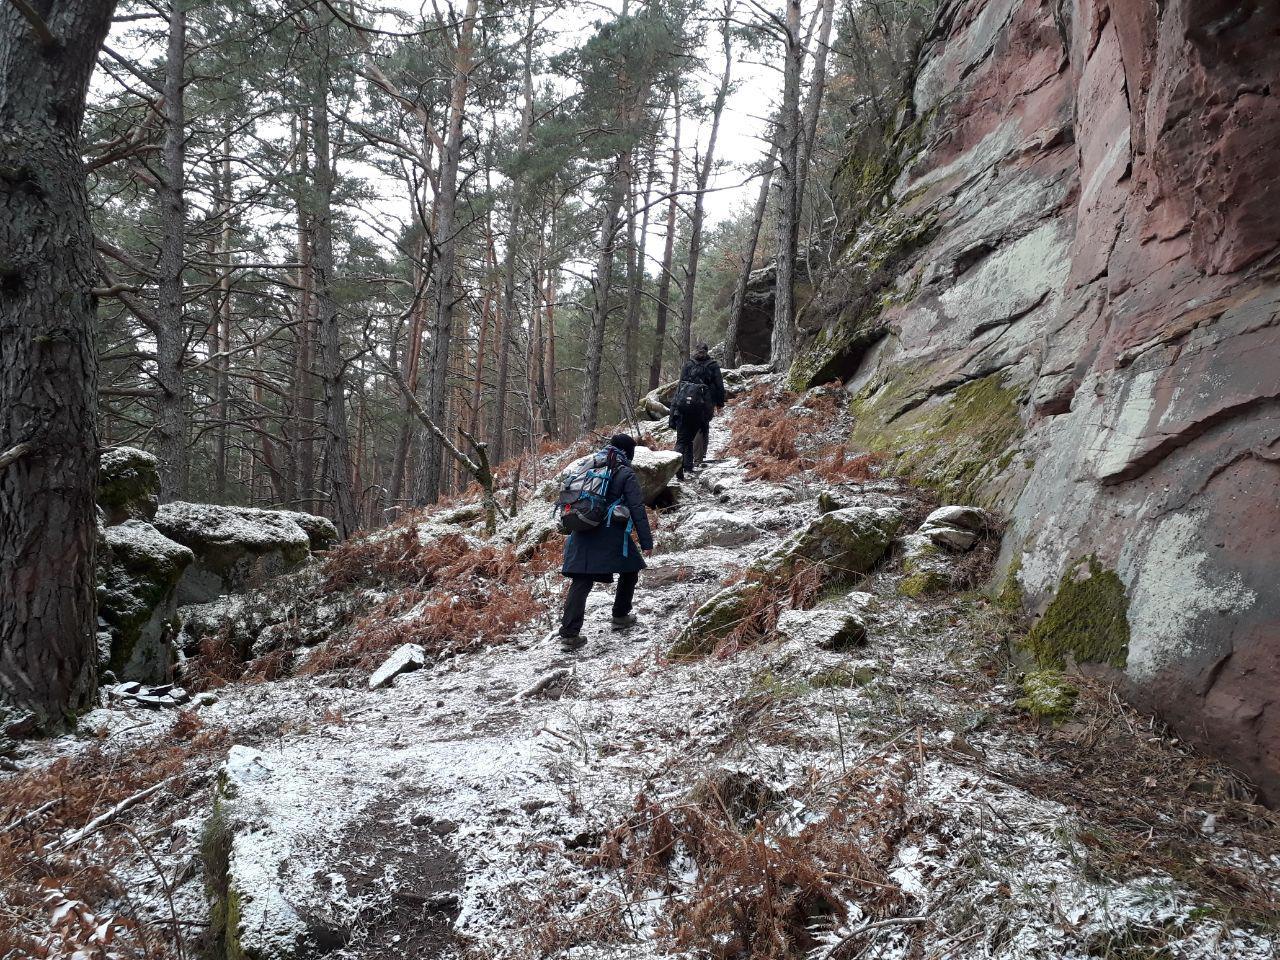 Eisenbahnfelsen im Dahner Felsenland (Pfälzer Wald 2018)